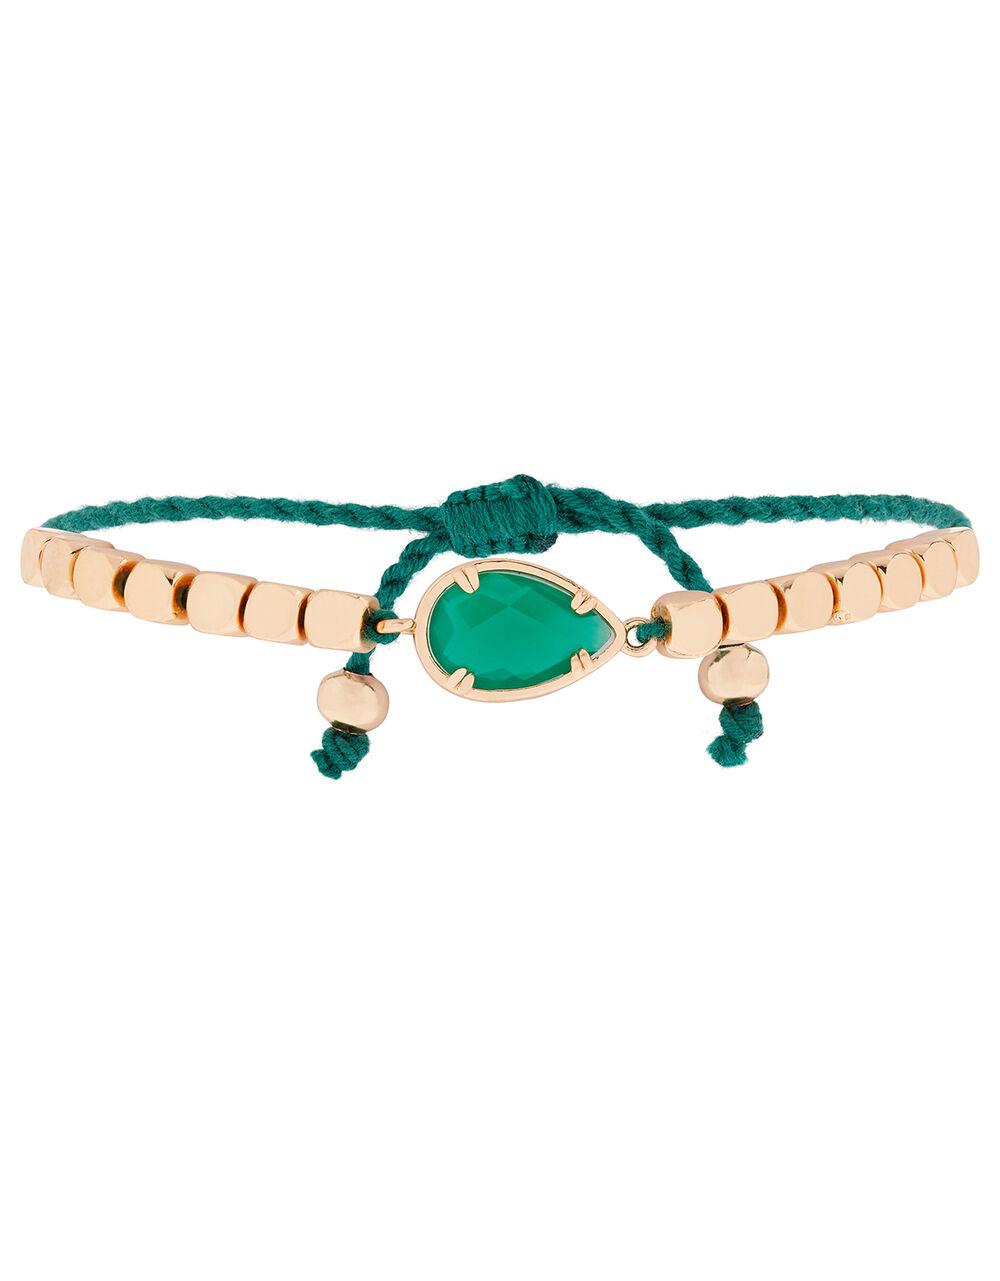 Stone and Bead Friendship Bracelet, , large